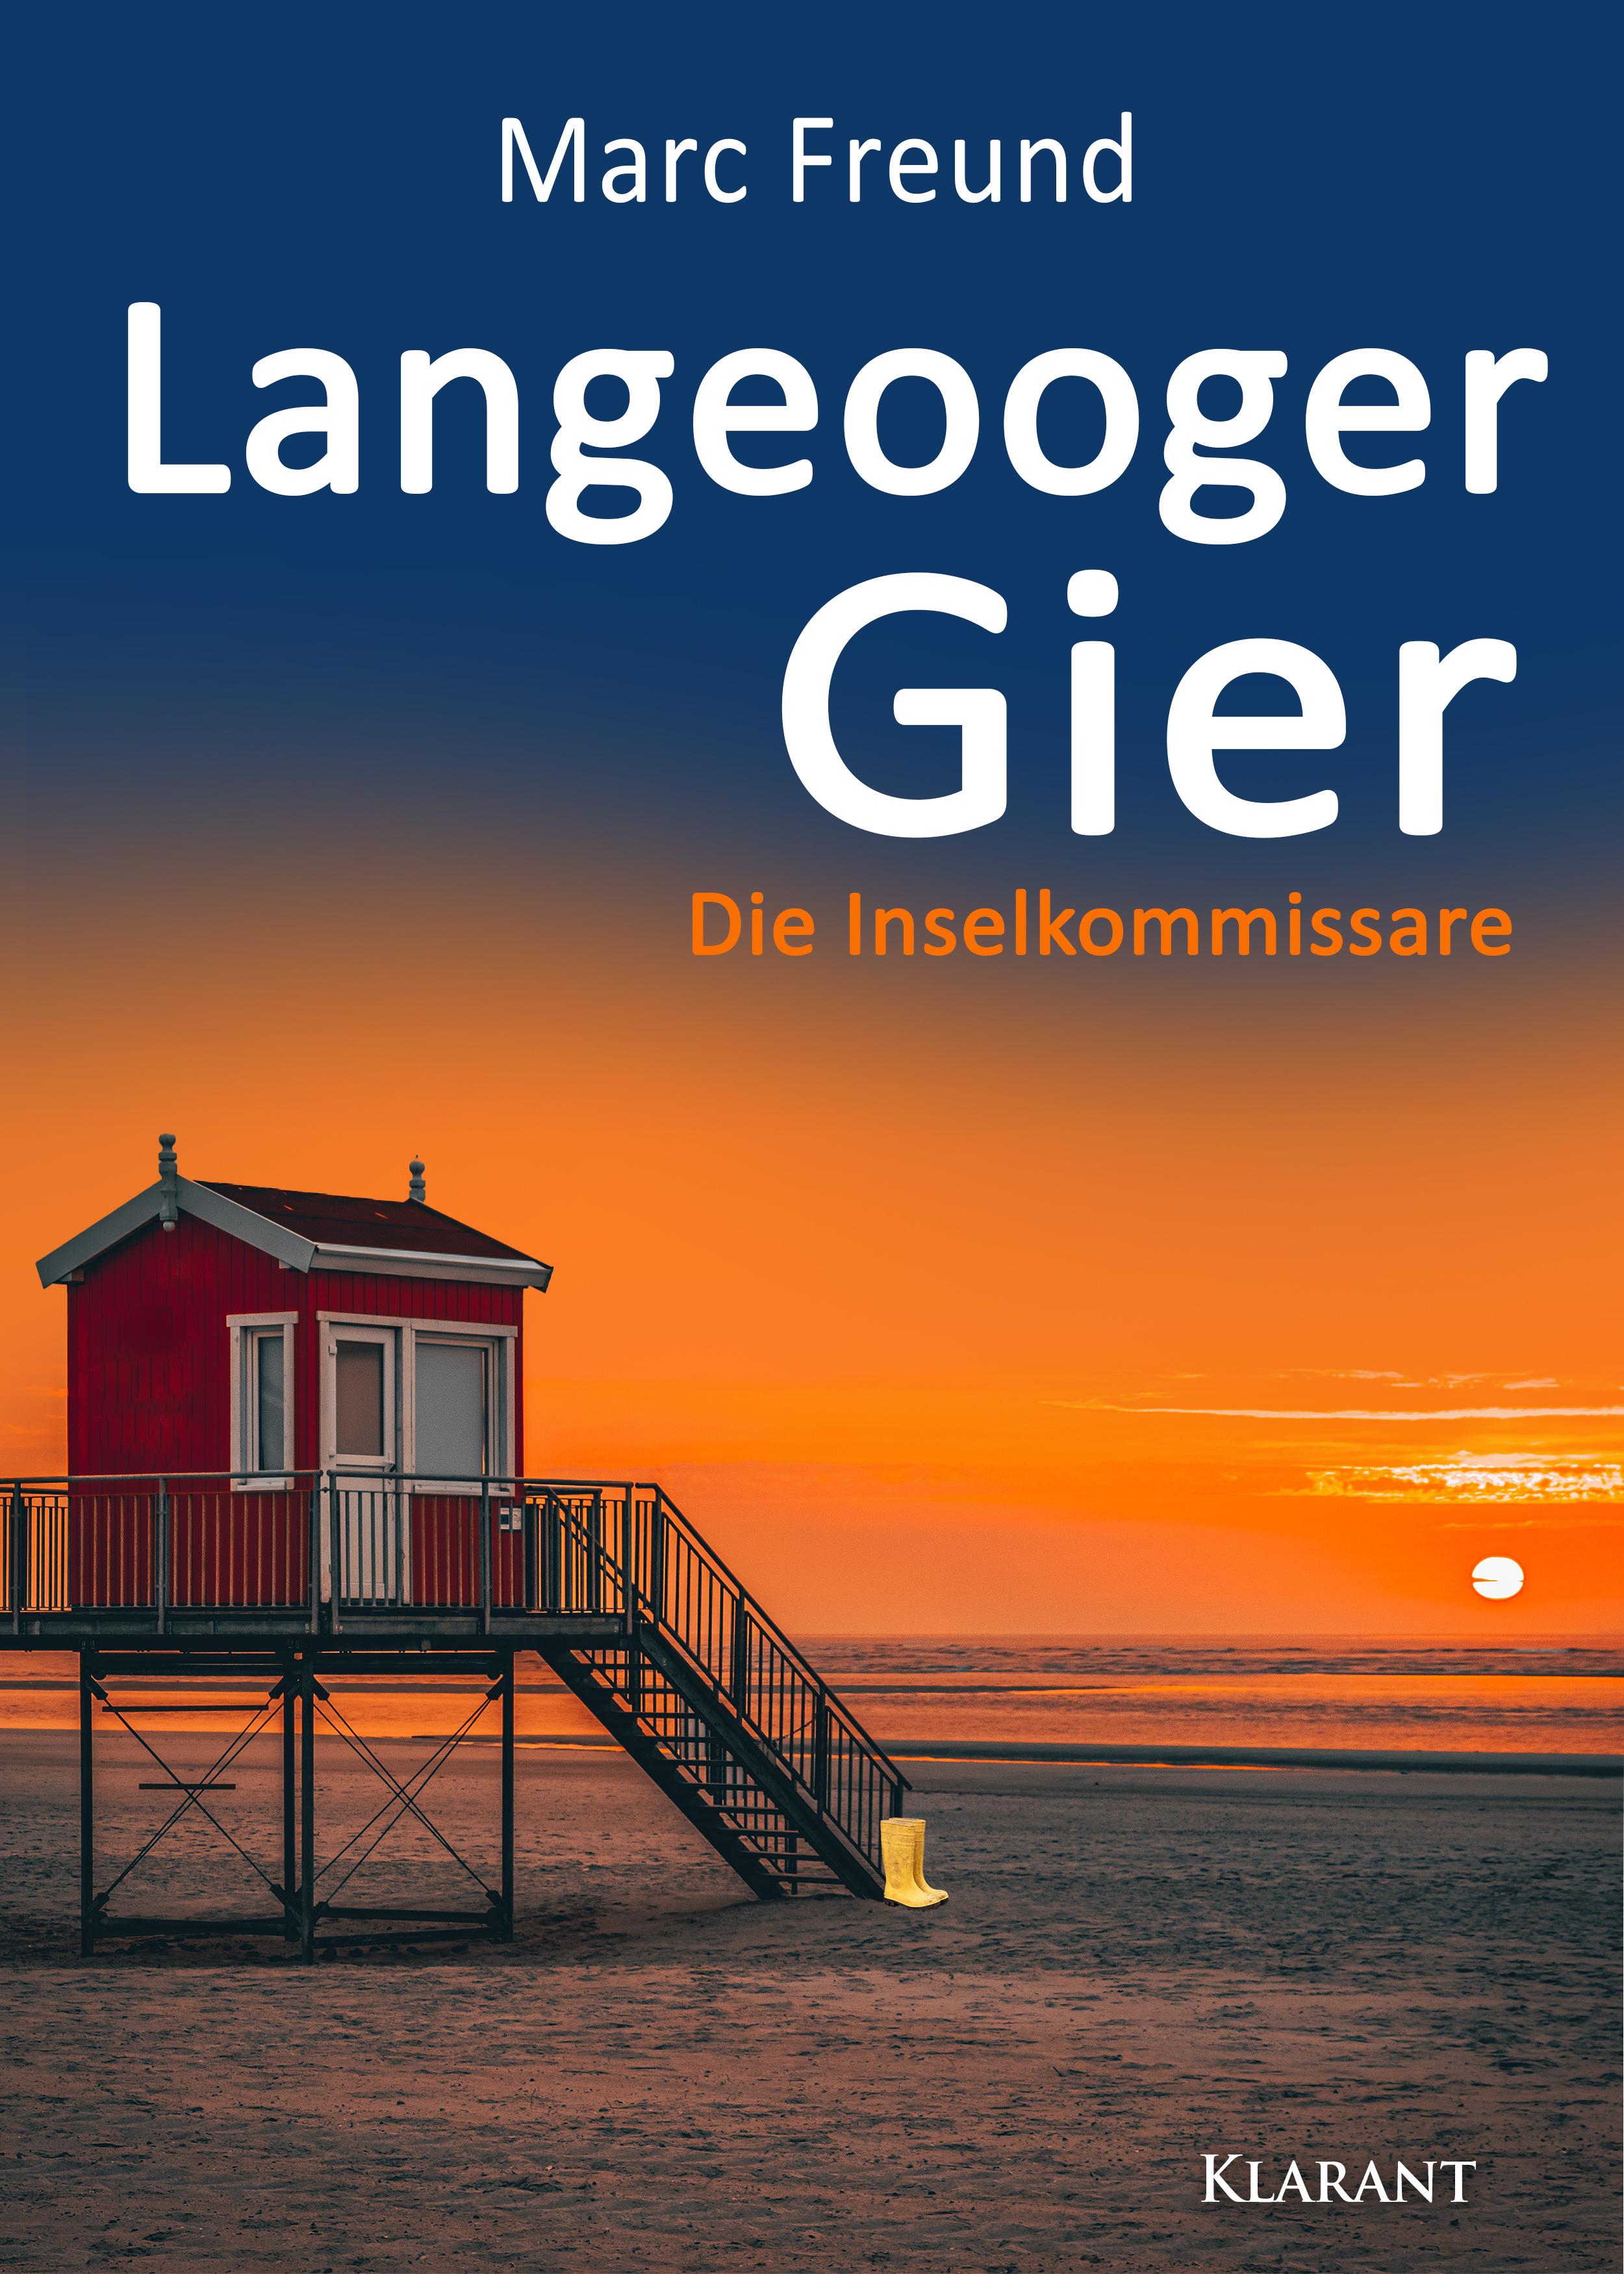 8161606496101885_LangeoogerGiermitGummisteifeln.jpg